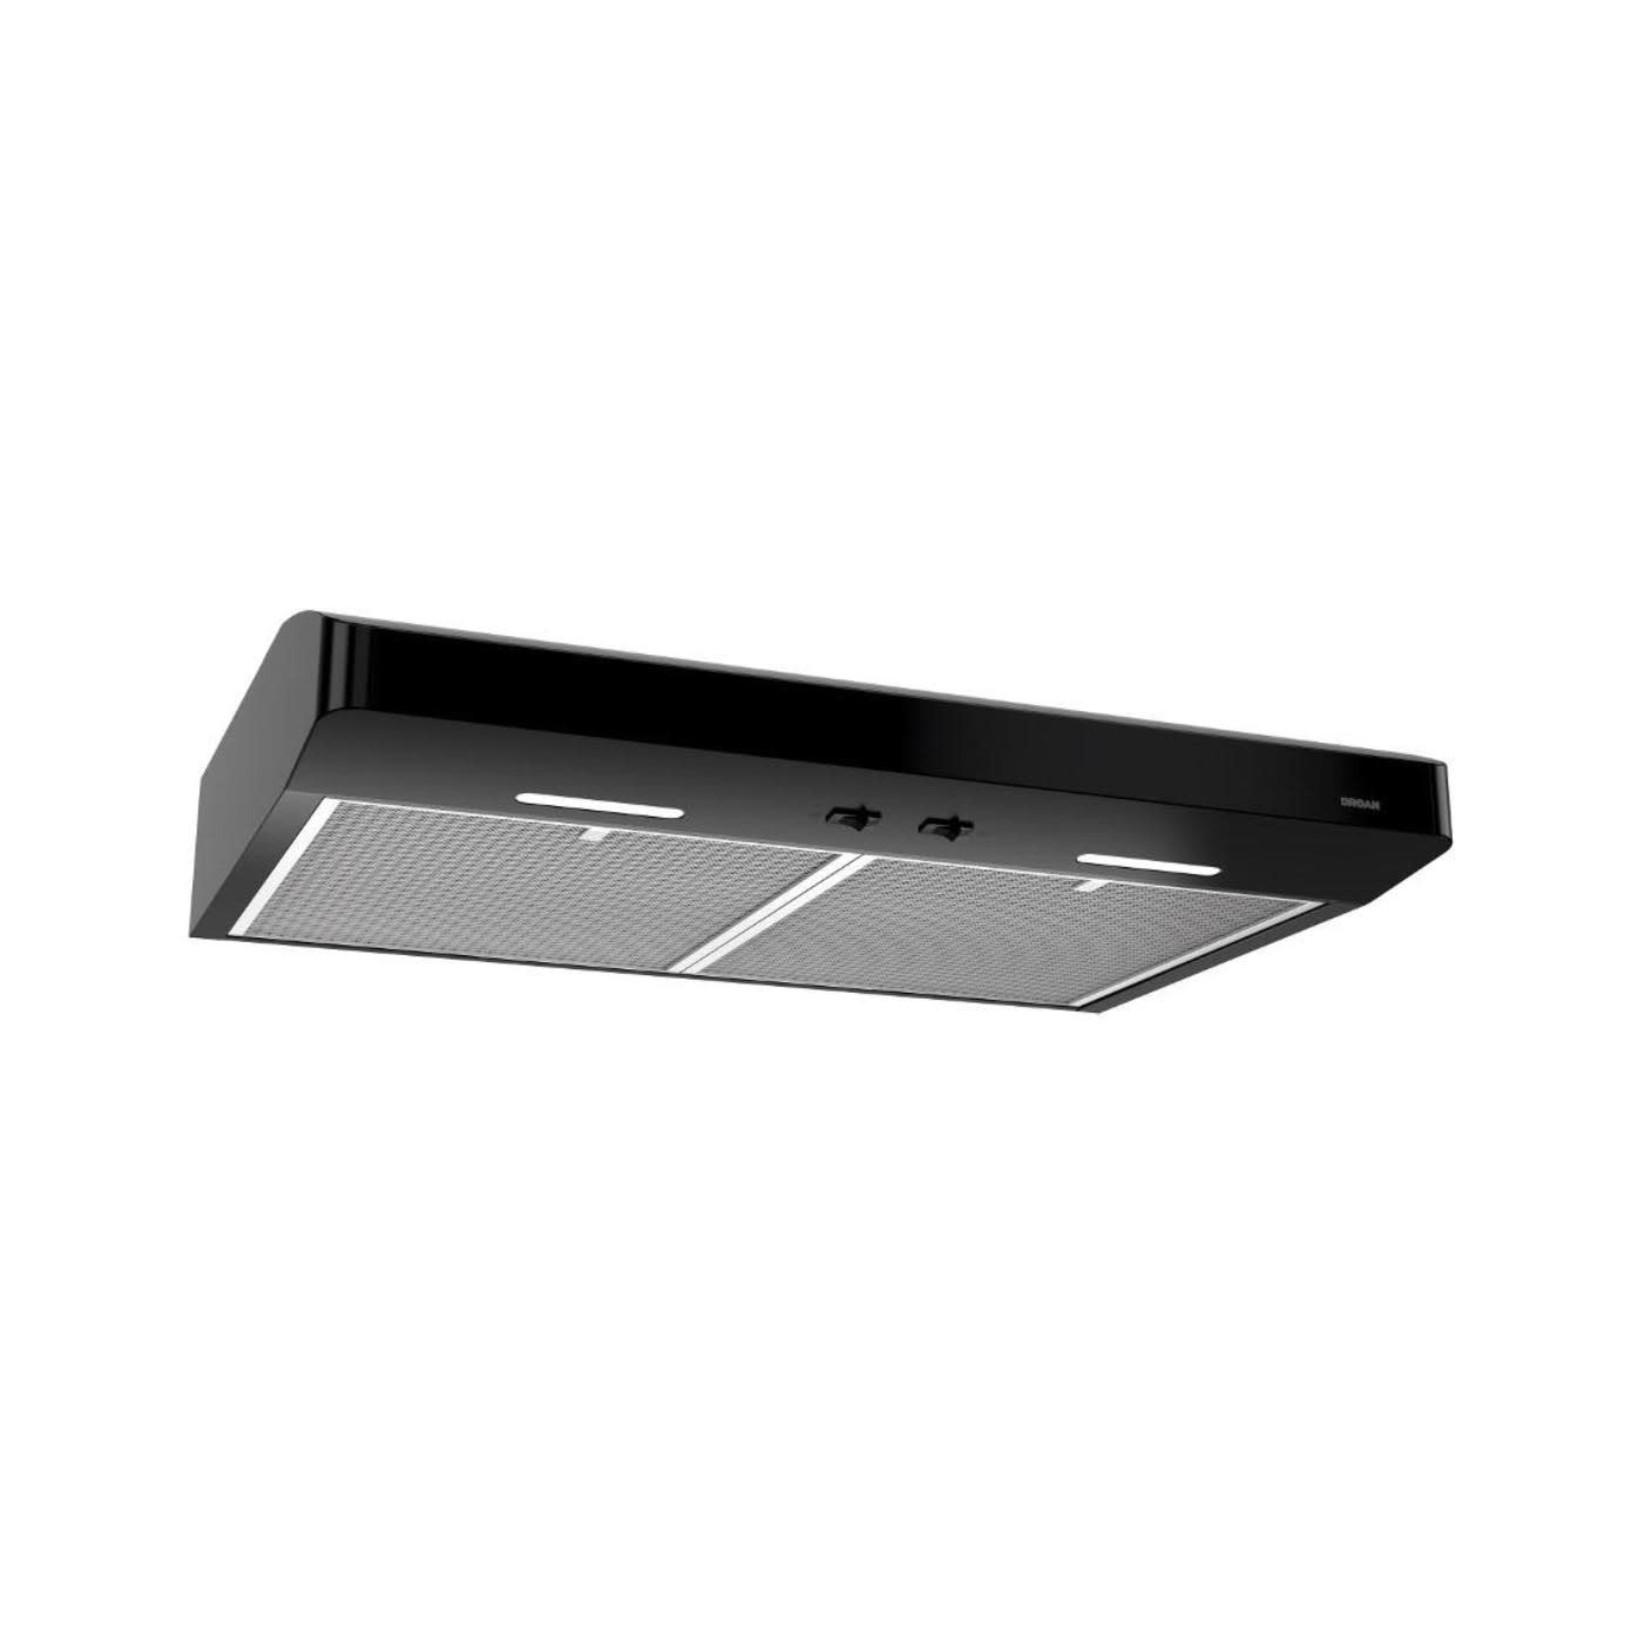 10574 Broan 30-Inch Convertible Under-Cabinet Range Hood